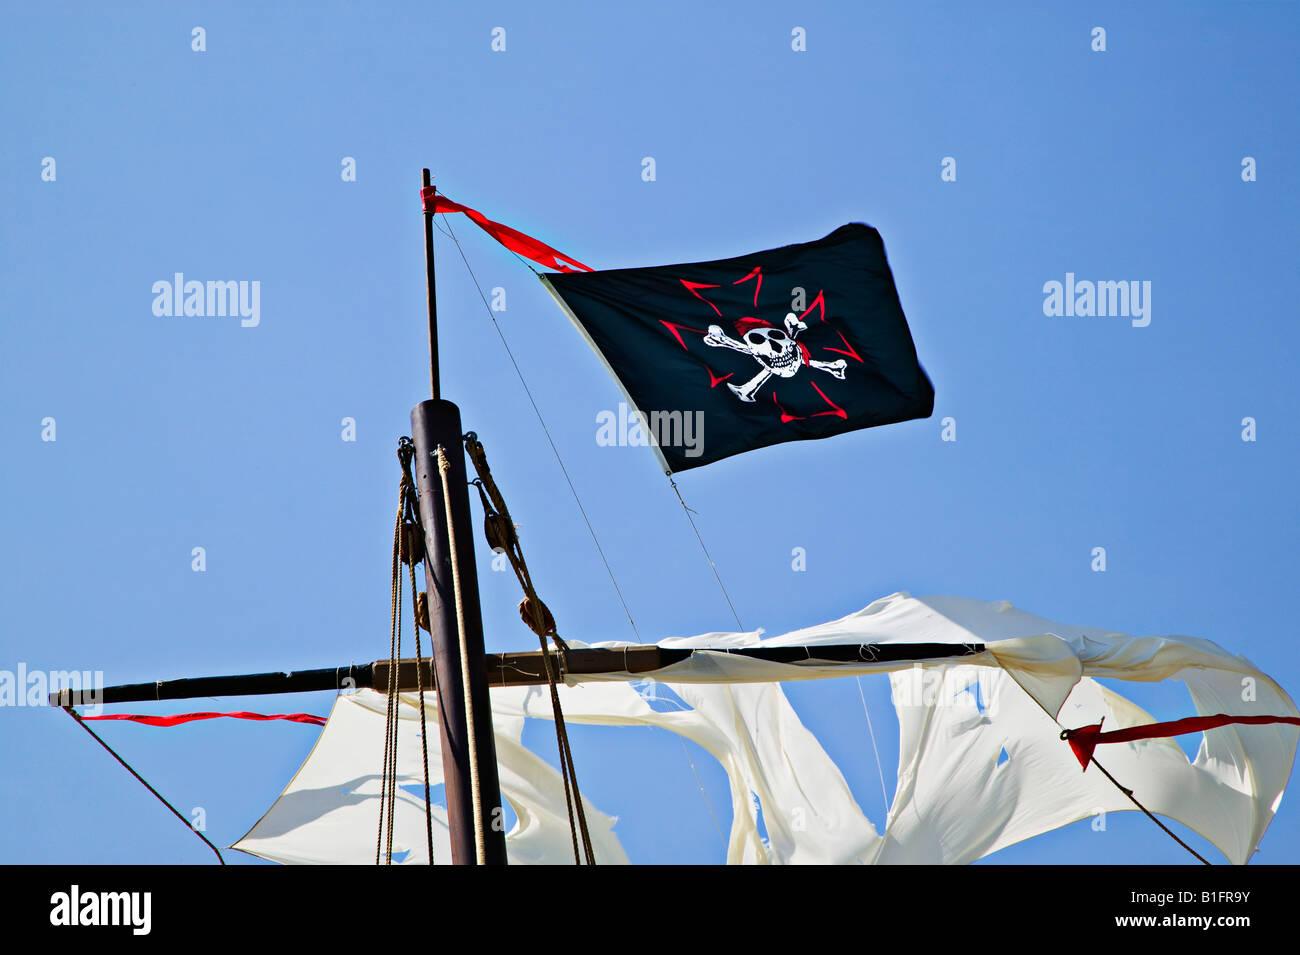 Pirate flag on ships mast - Stock Image